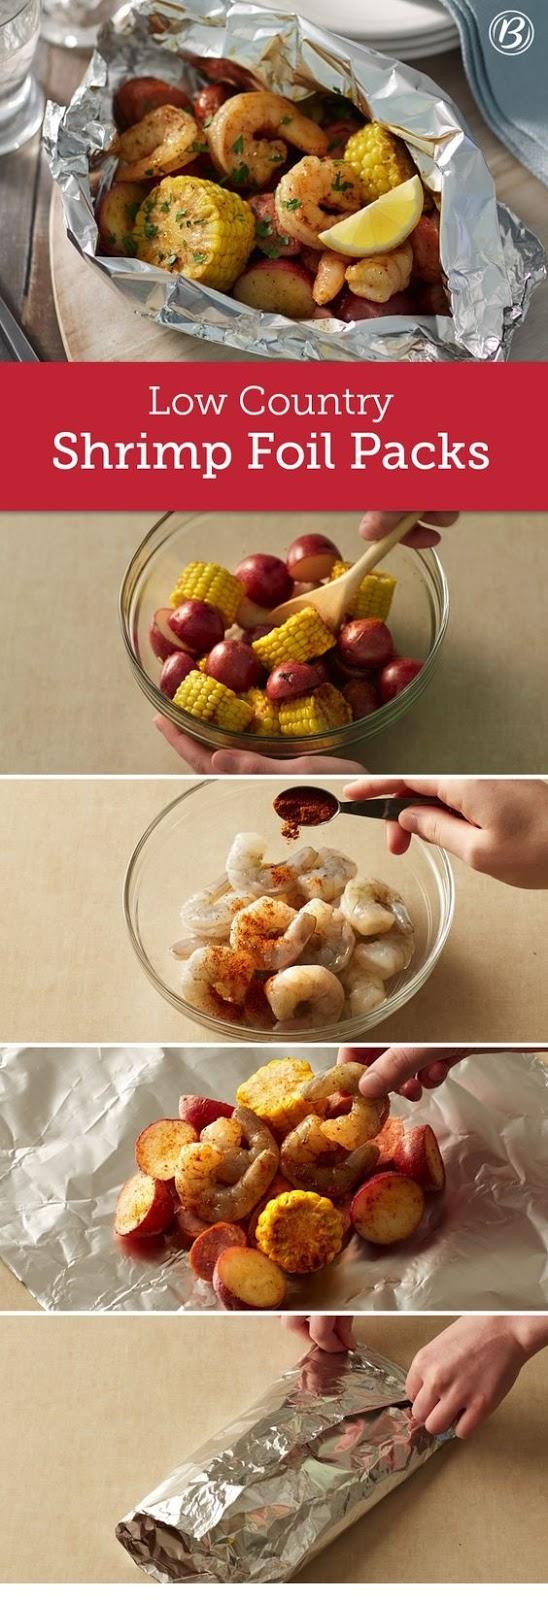 Low Country Shrimp Foil Packs